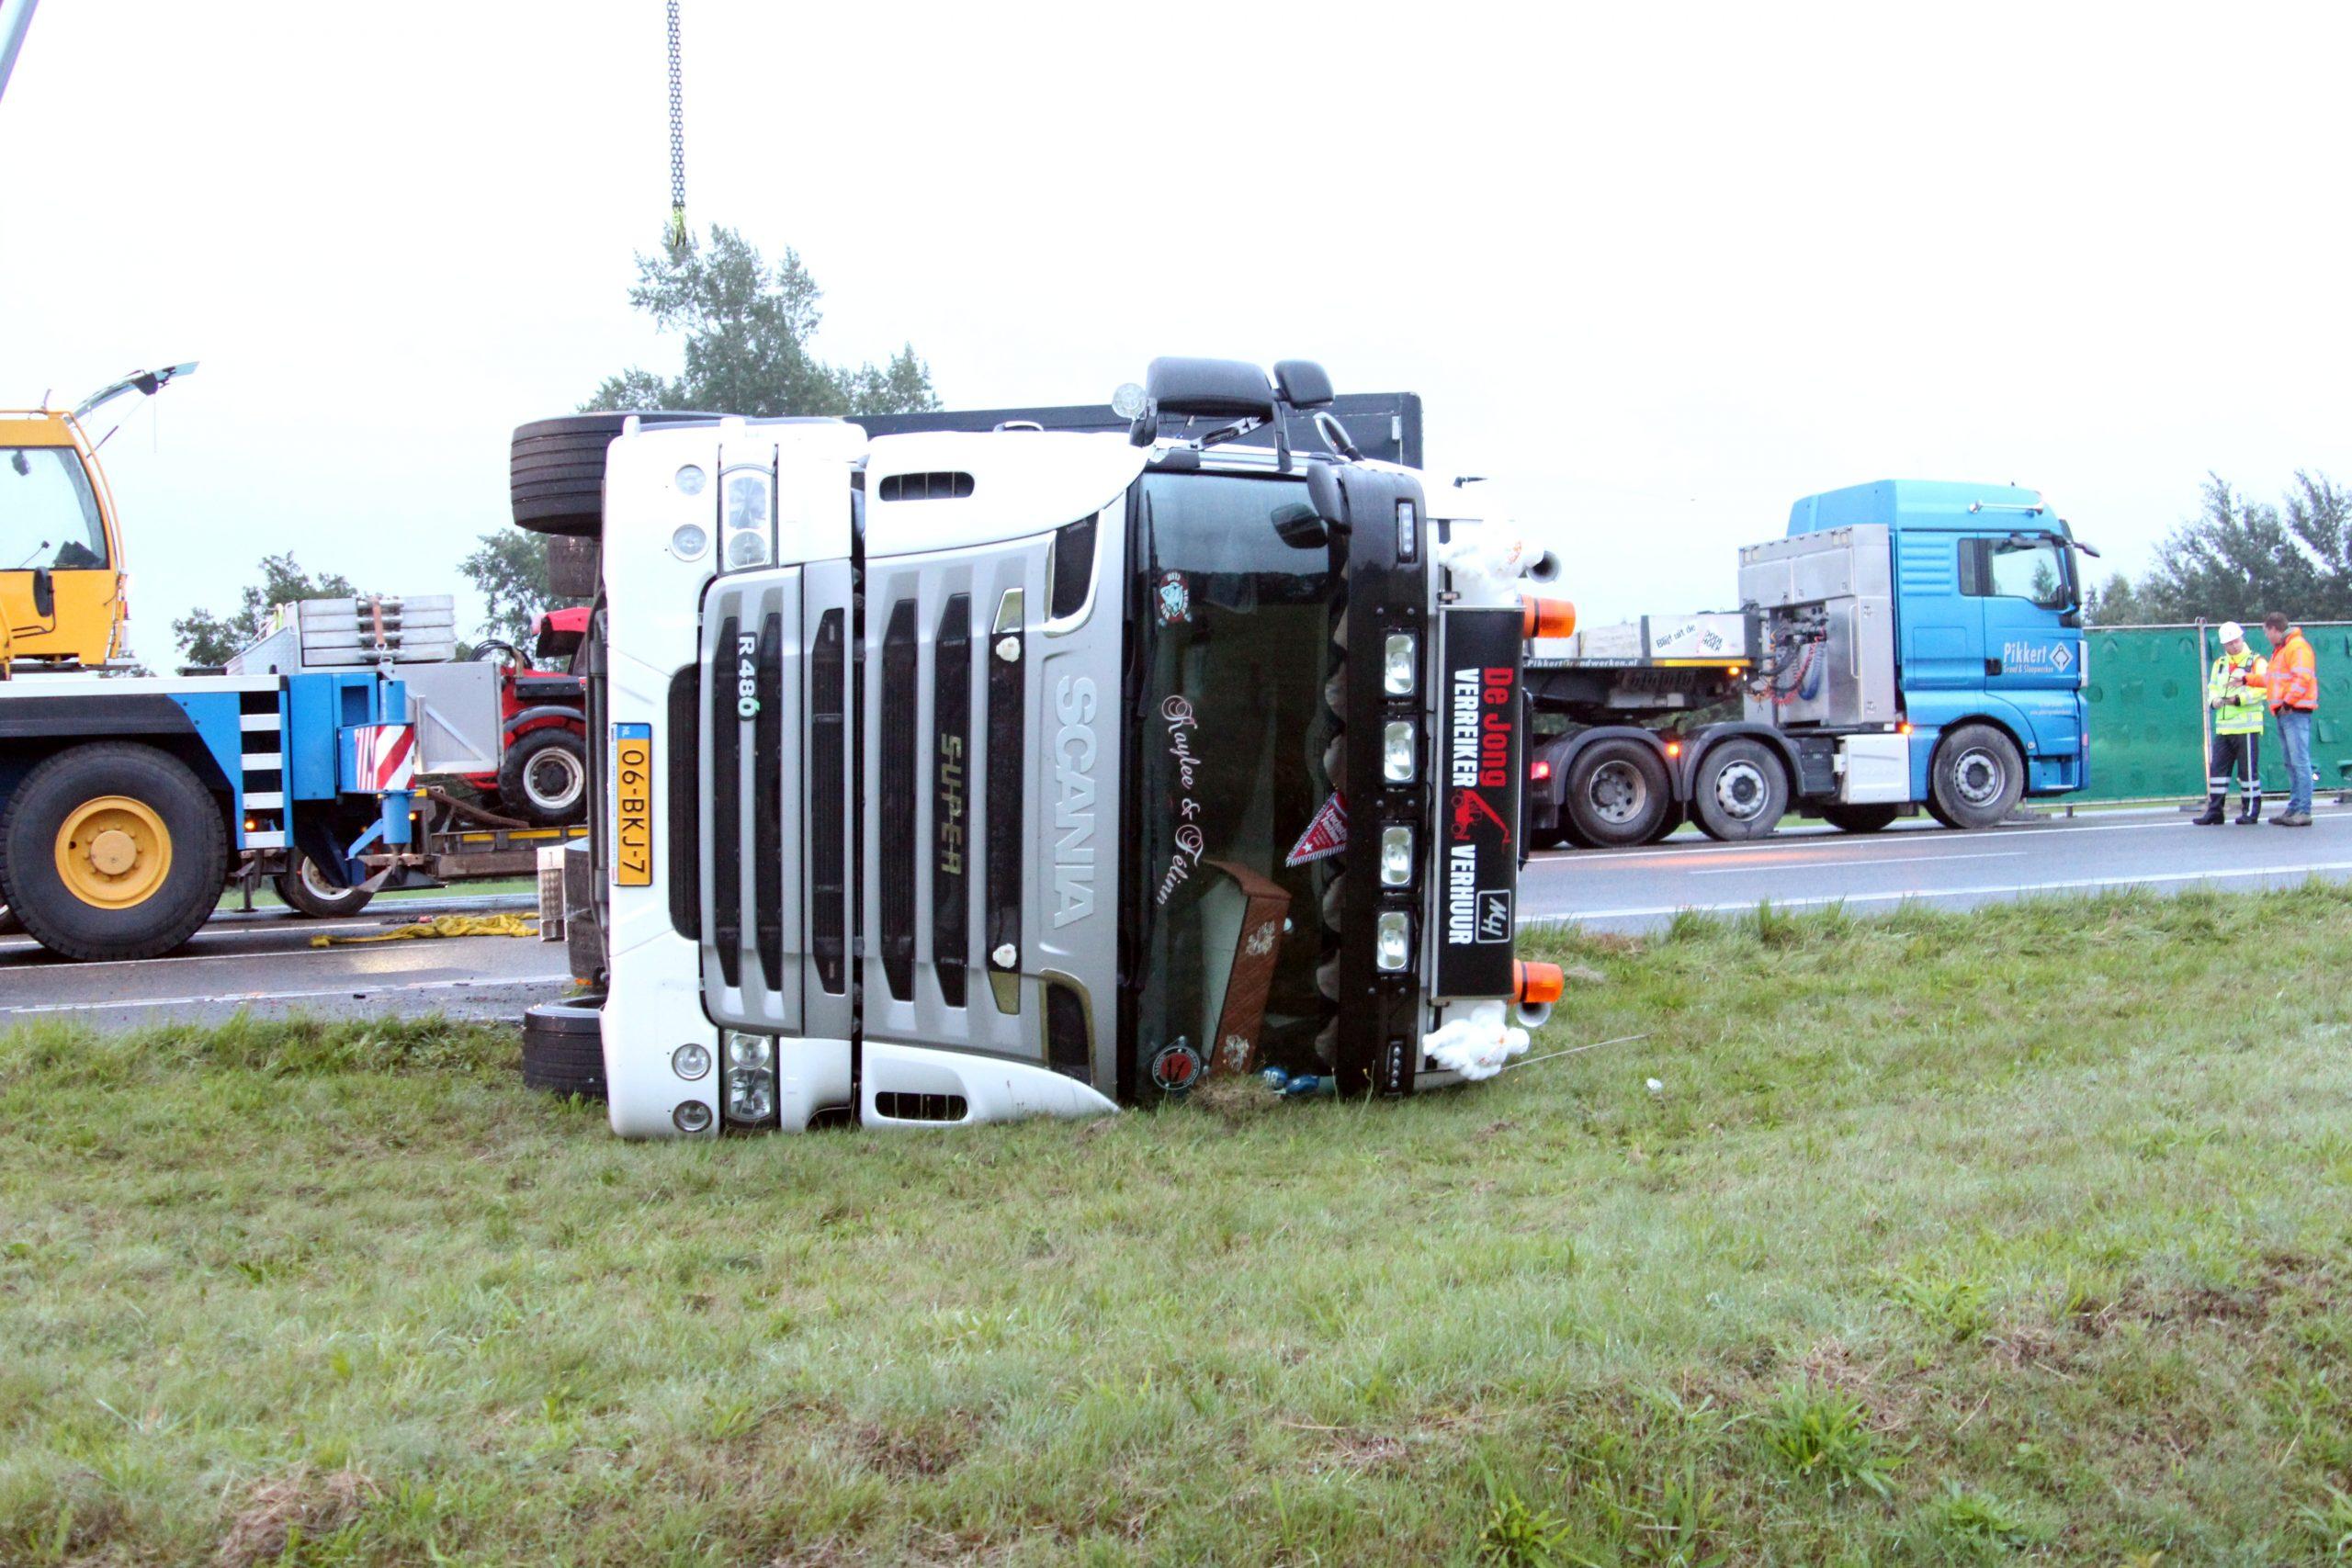 Video A7 richting Frieschepalen afgesloten na gekantelde vrachtwagen